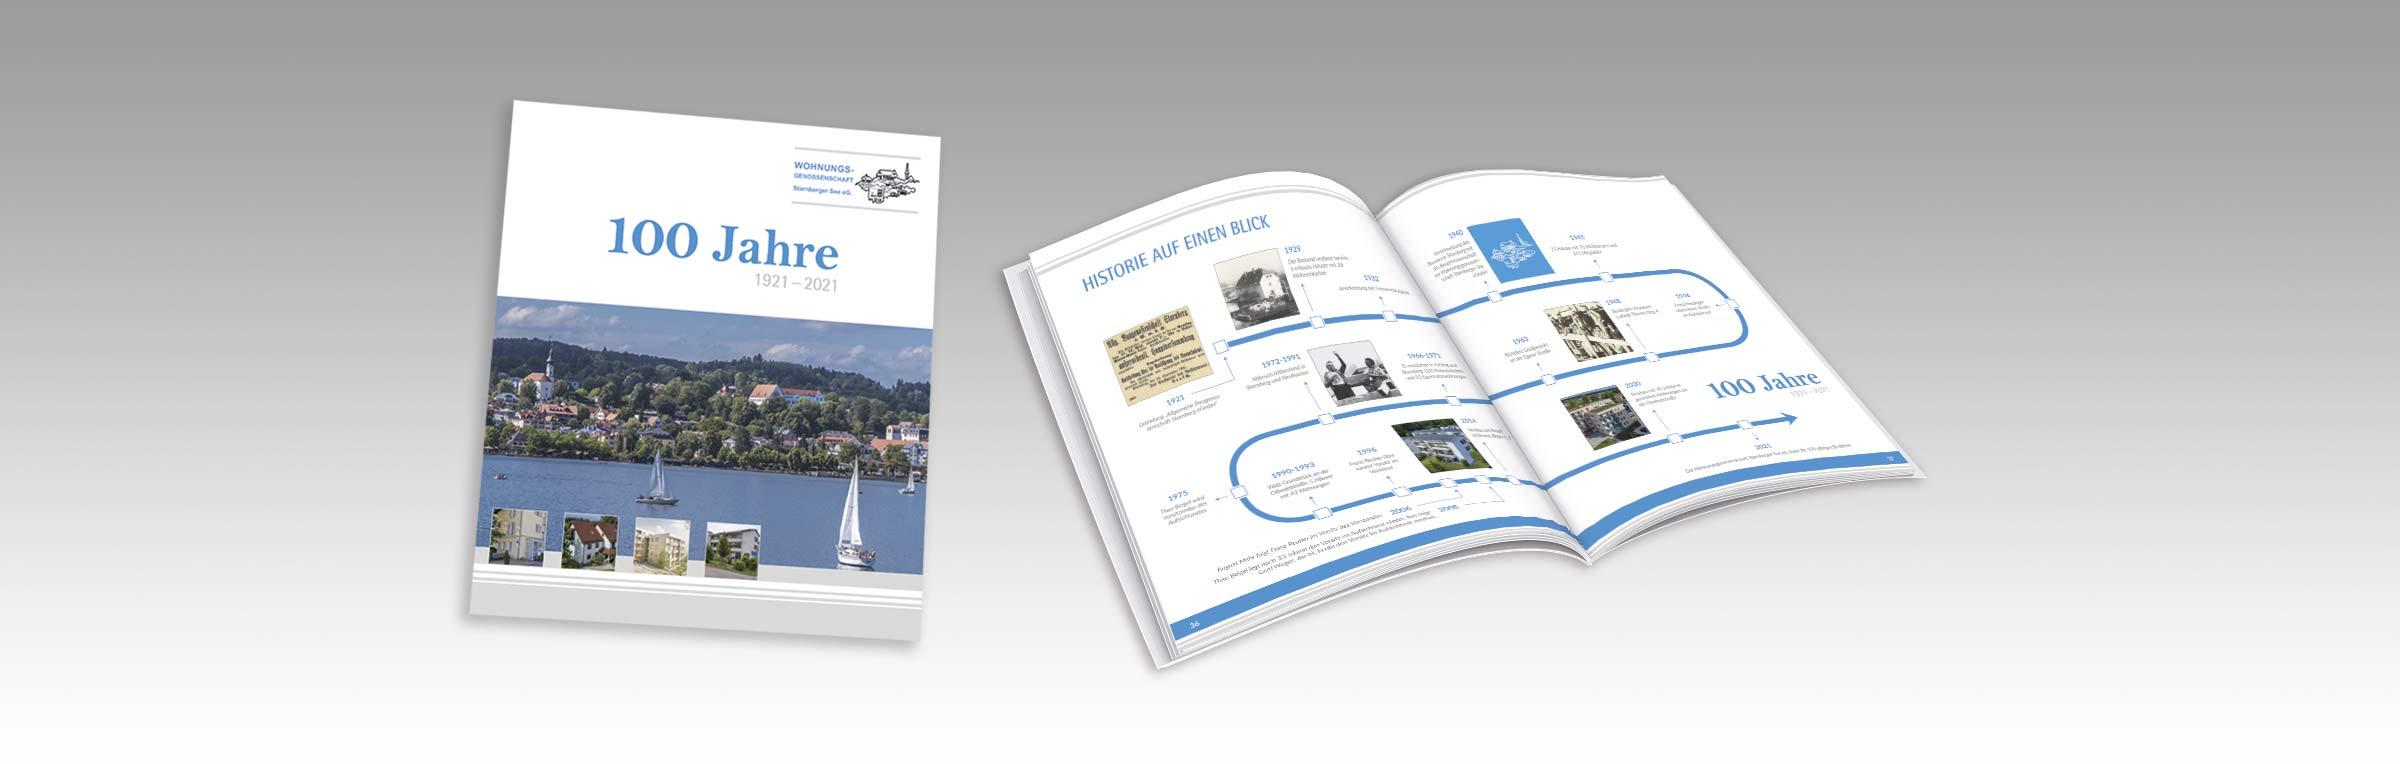 Festschrift Wohnungsgenossenschaft Starnberger See eG.